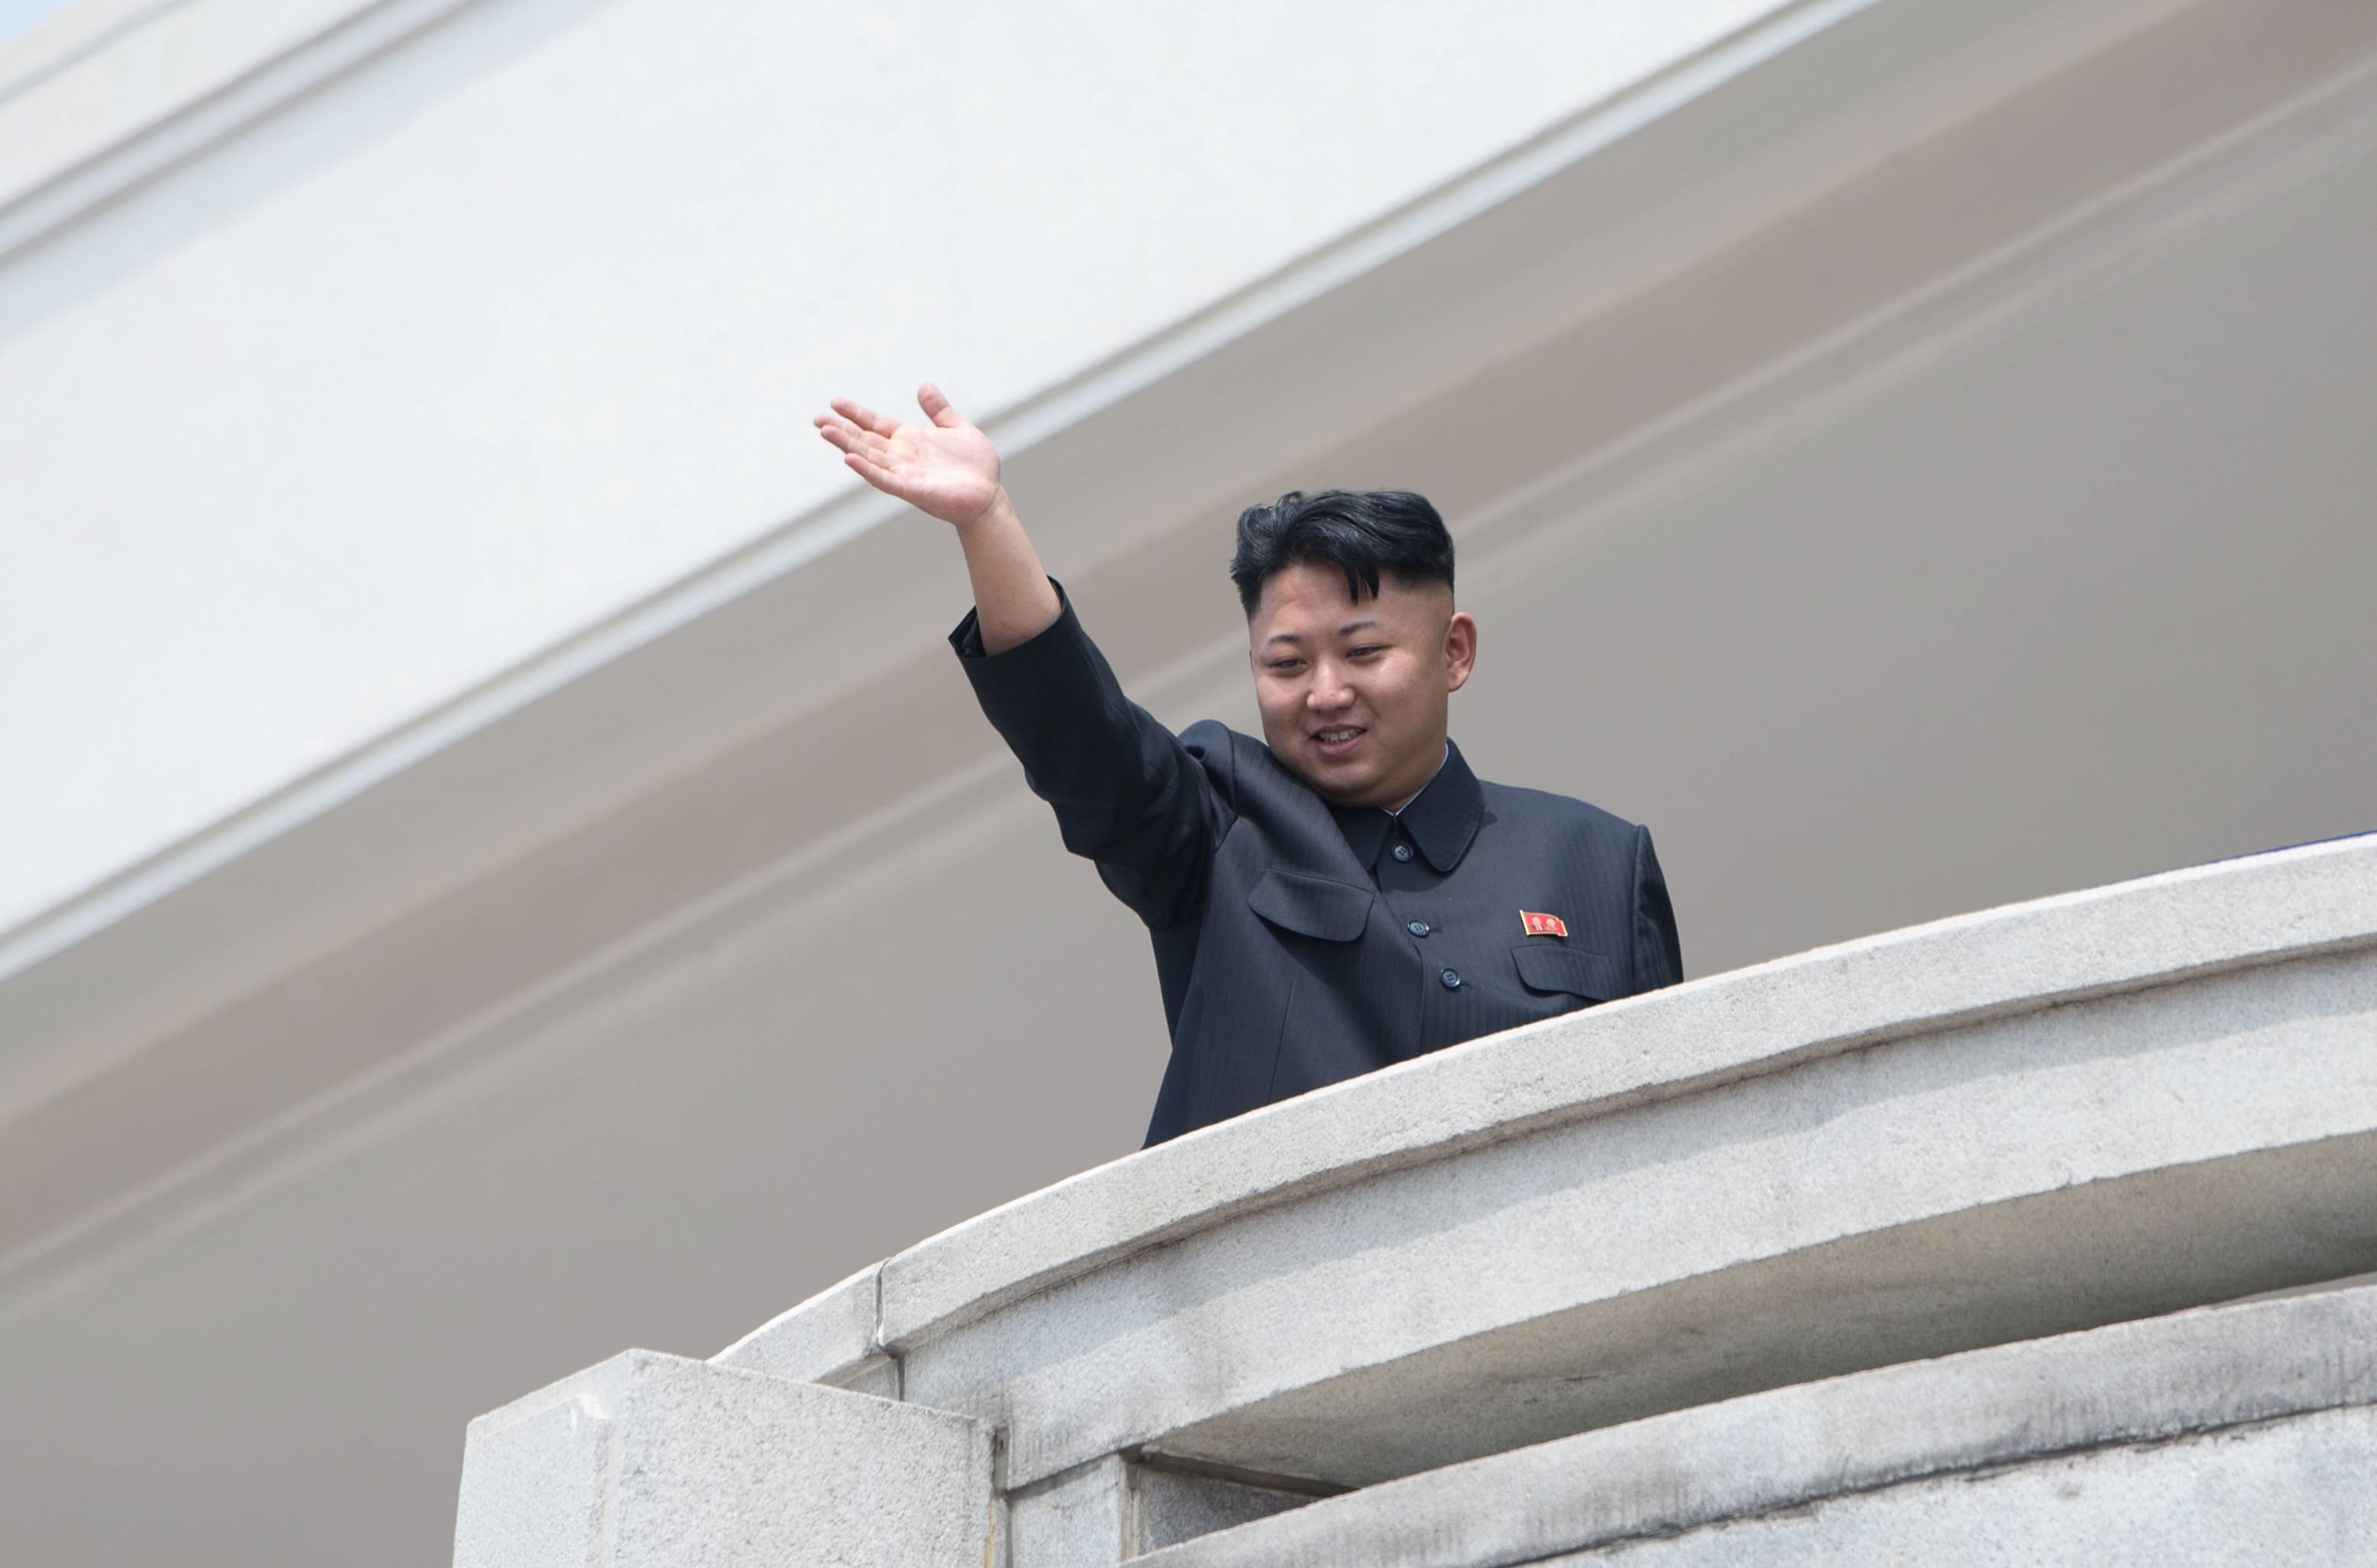 Kim Jong Un waving